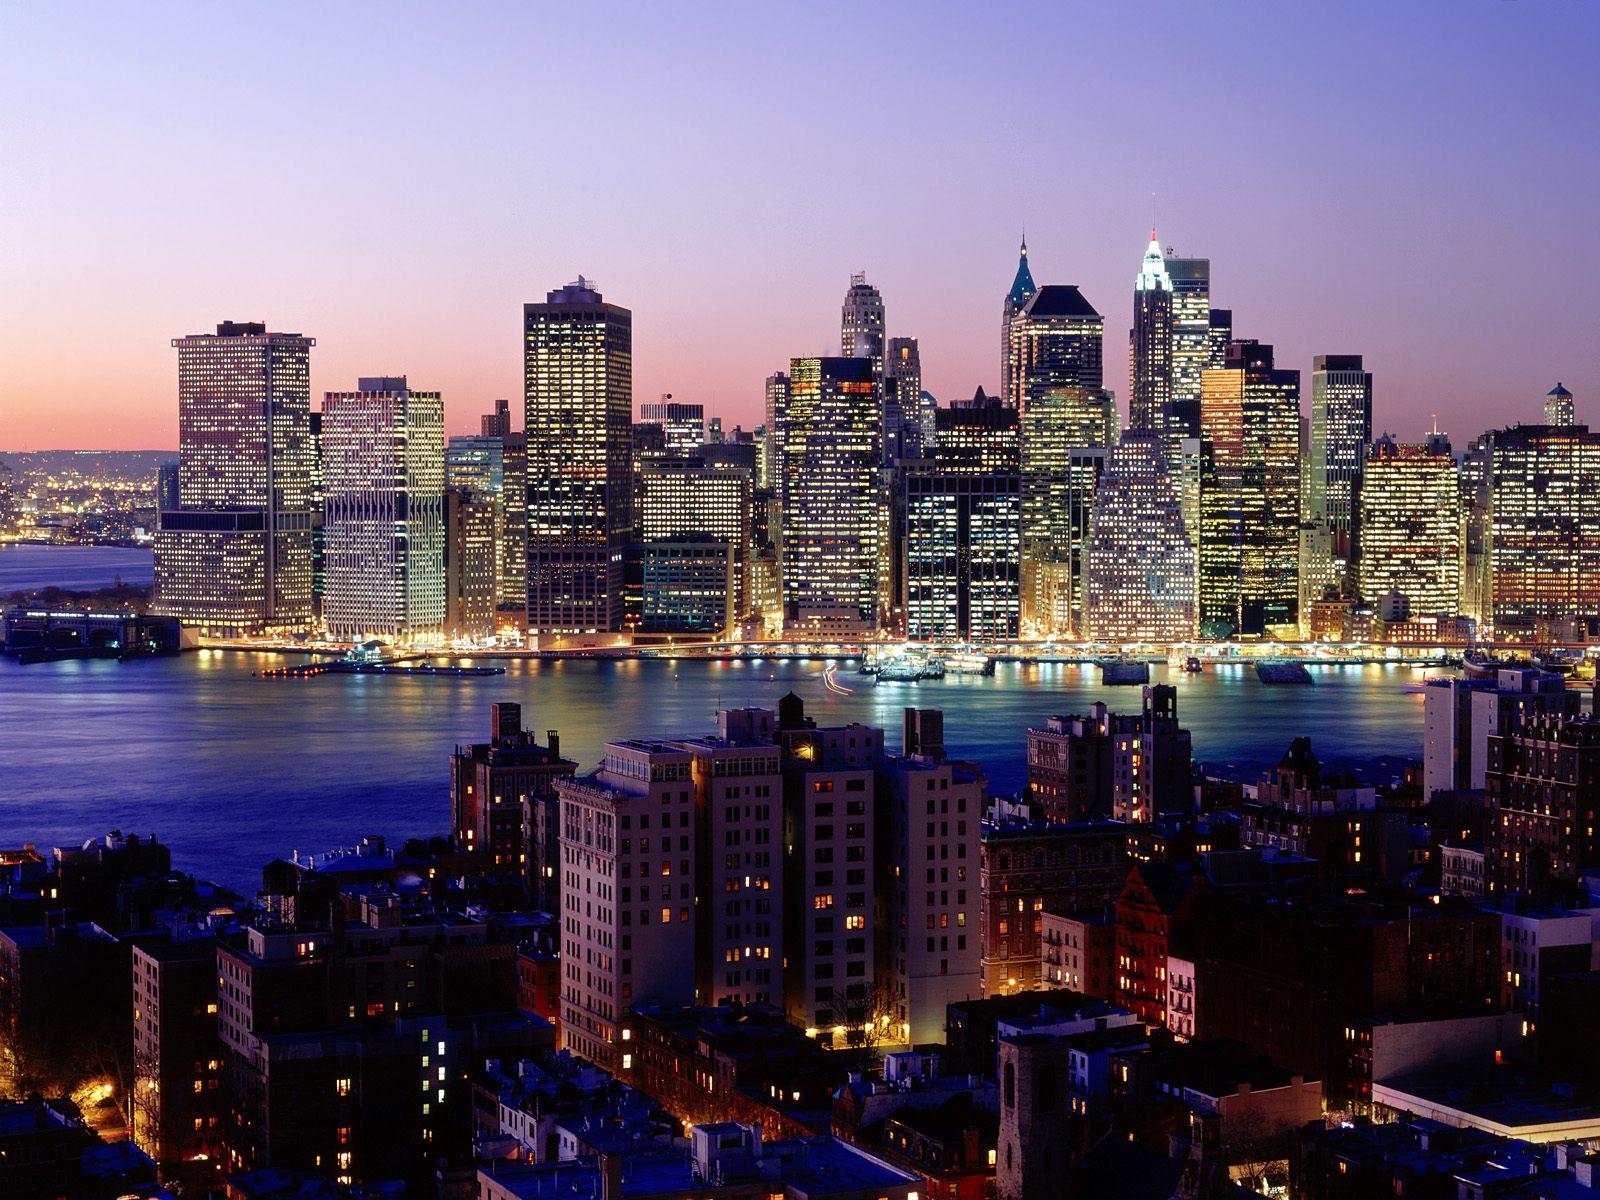 Twilight Sky New York Wallpapers HD Wallpapers 1600x1200